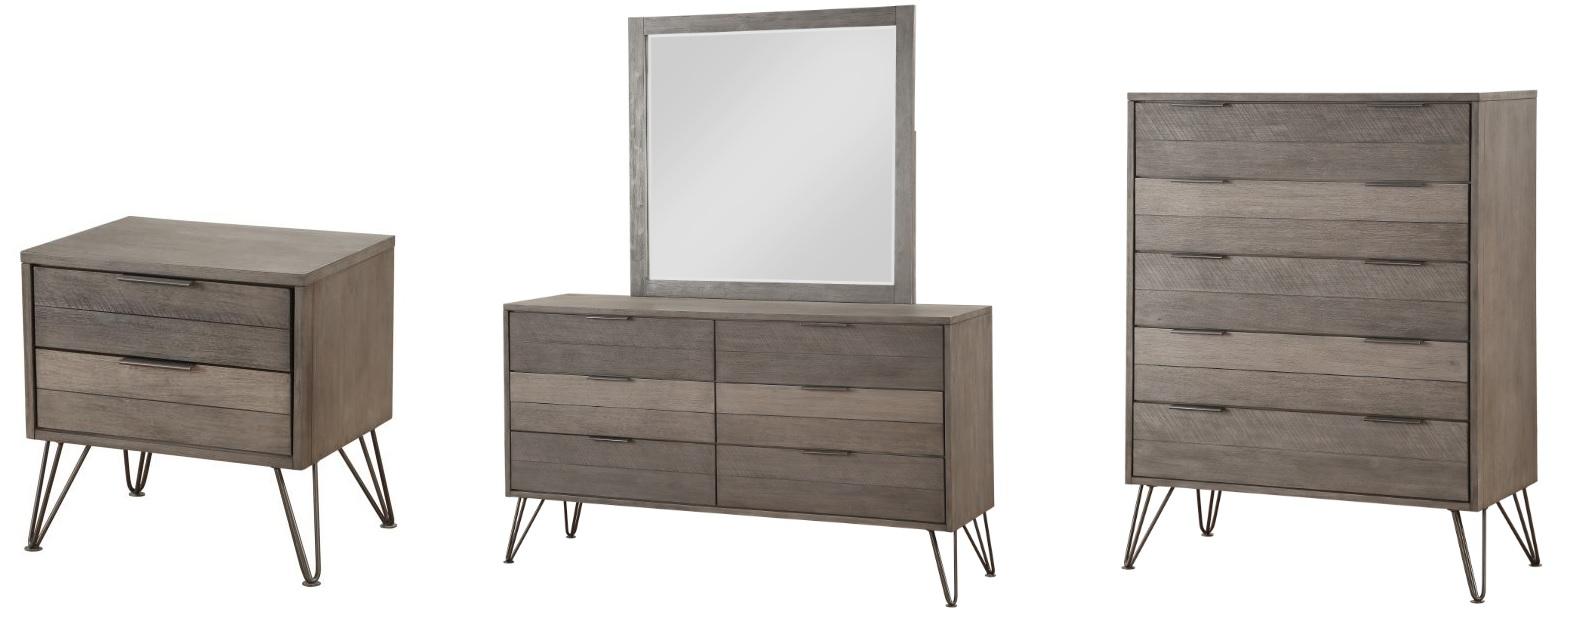 Contemporary Beds Lv 1604 Furniture Store Toronto